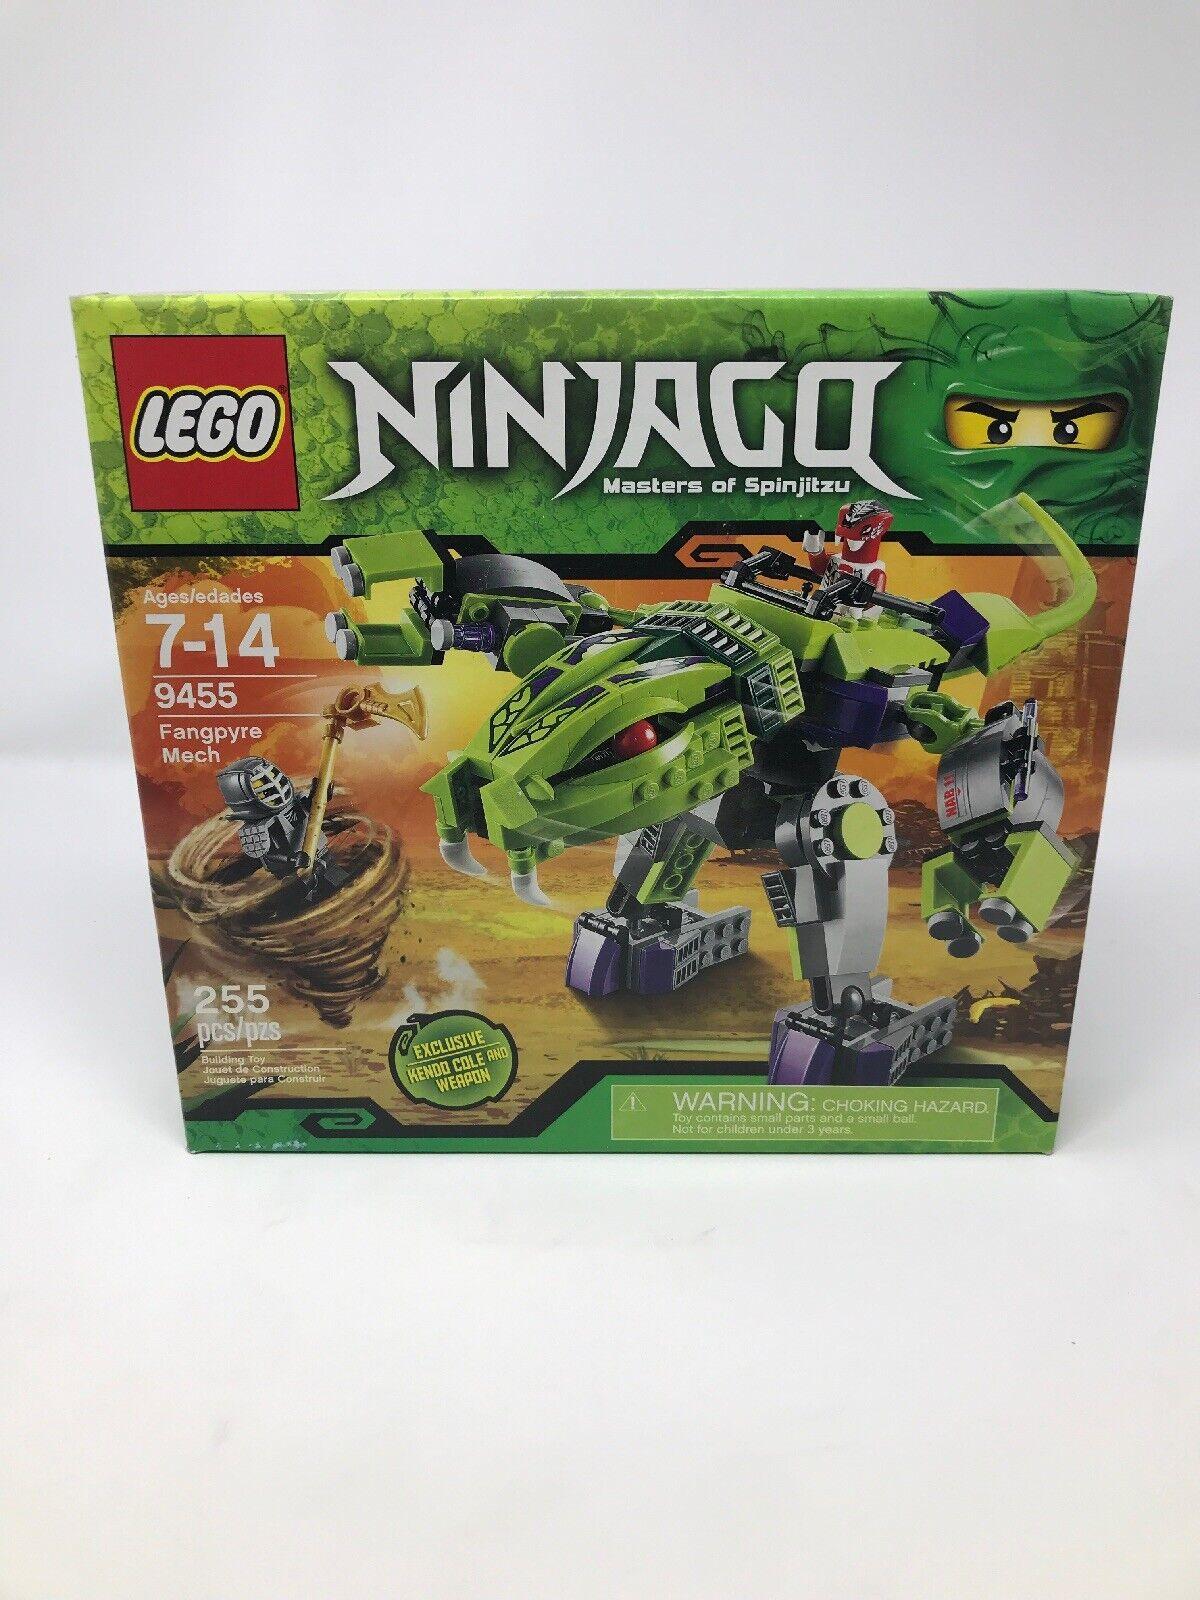 New Lego Ninjago Fangpyre Mech Set 9455